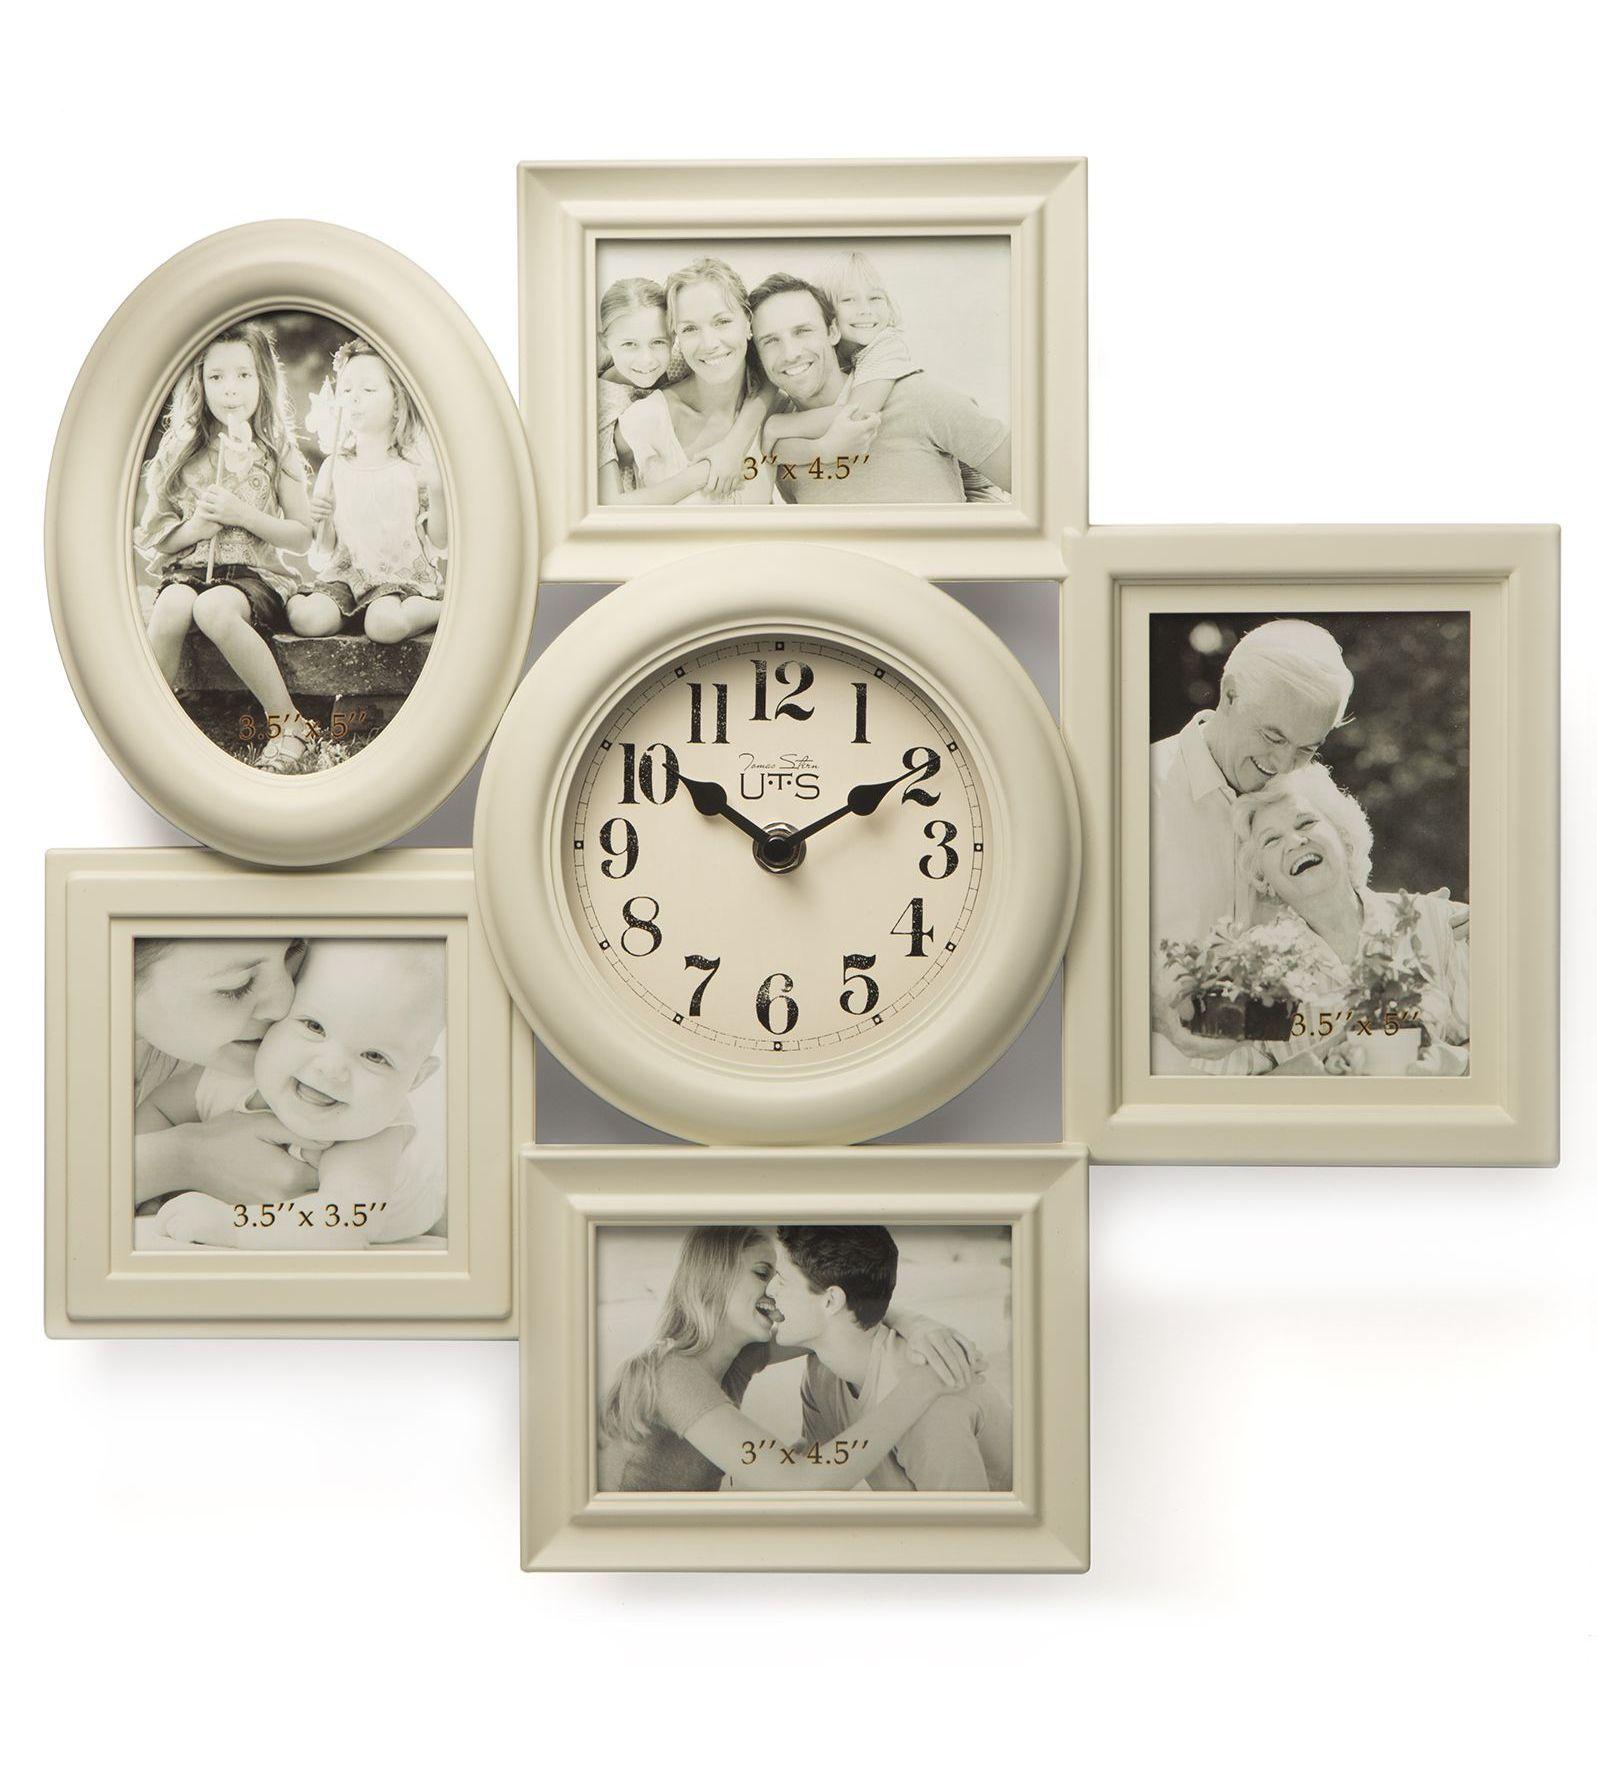 Часы настенные Часы настенные Tomas Stern 9012 chasy-nastennye-tomas-stern-9012-germaniya.jpg